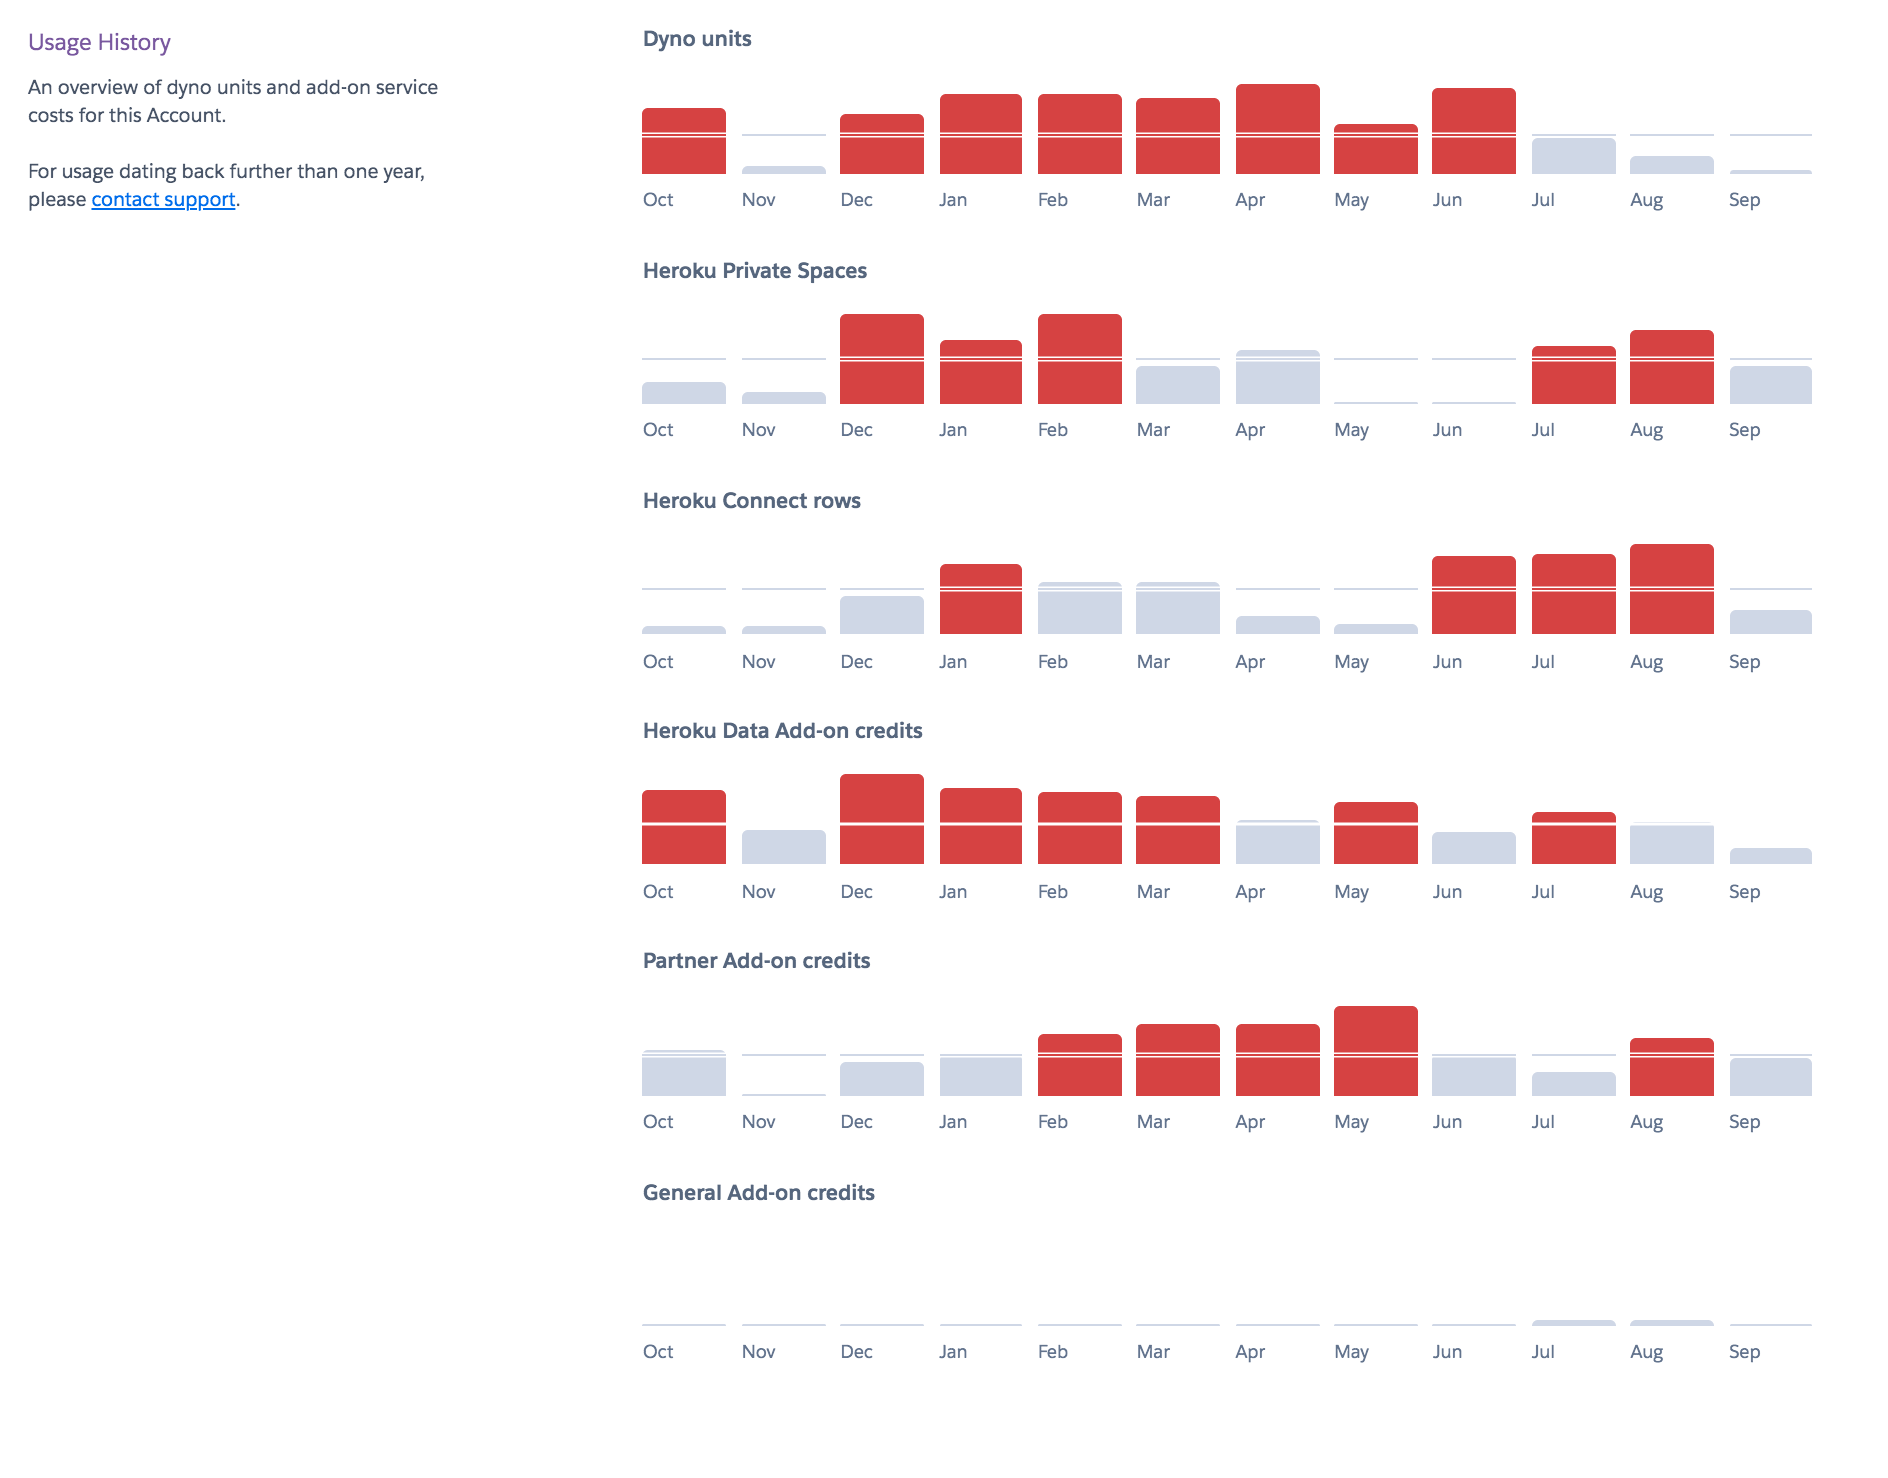 Enterprise Accounts usage graph